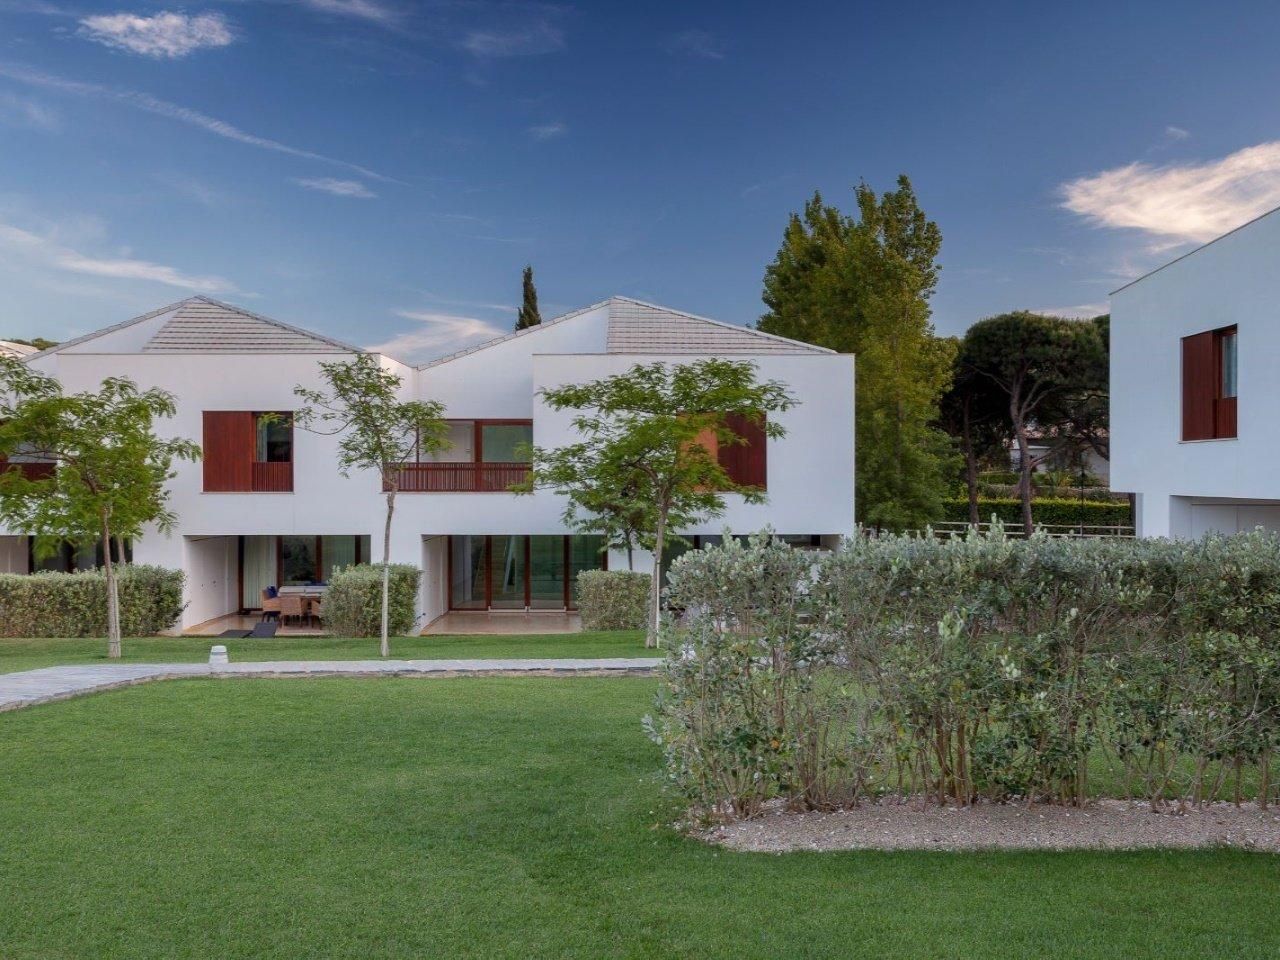 4 Bedroom Townhouse Albufeira, Central Algarve Ref: AVA45